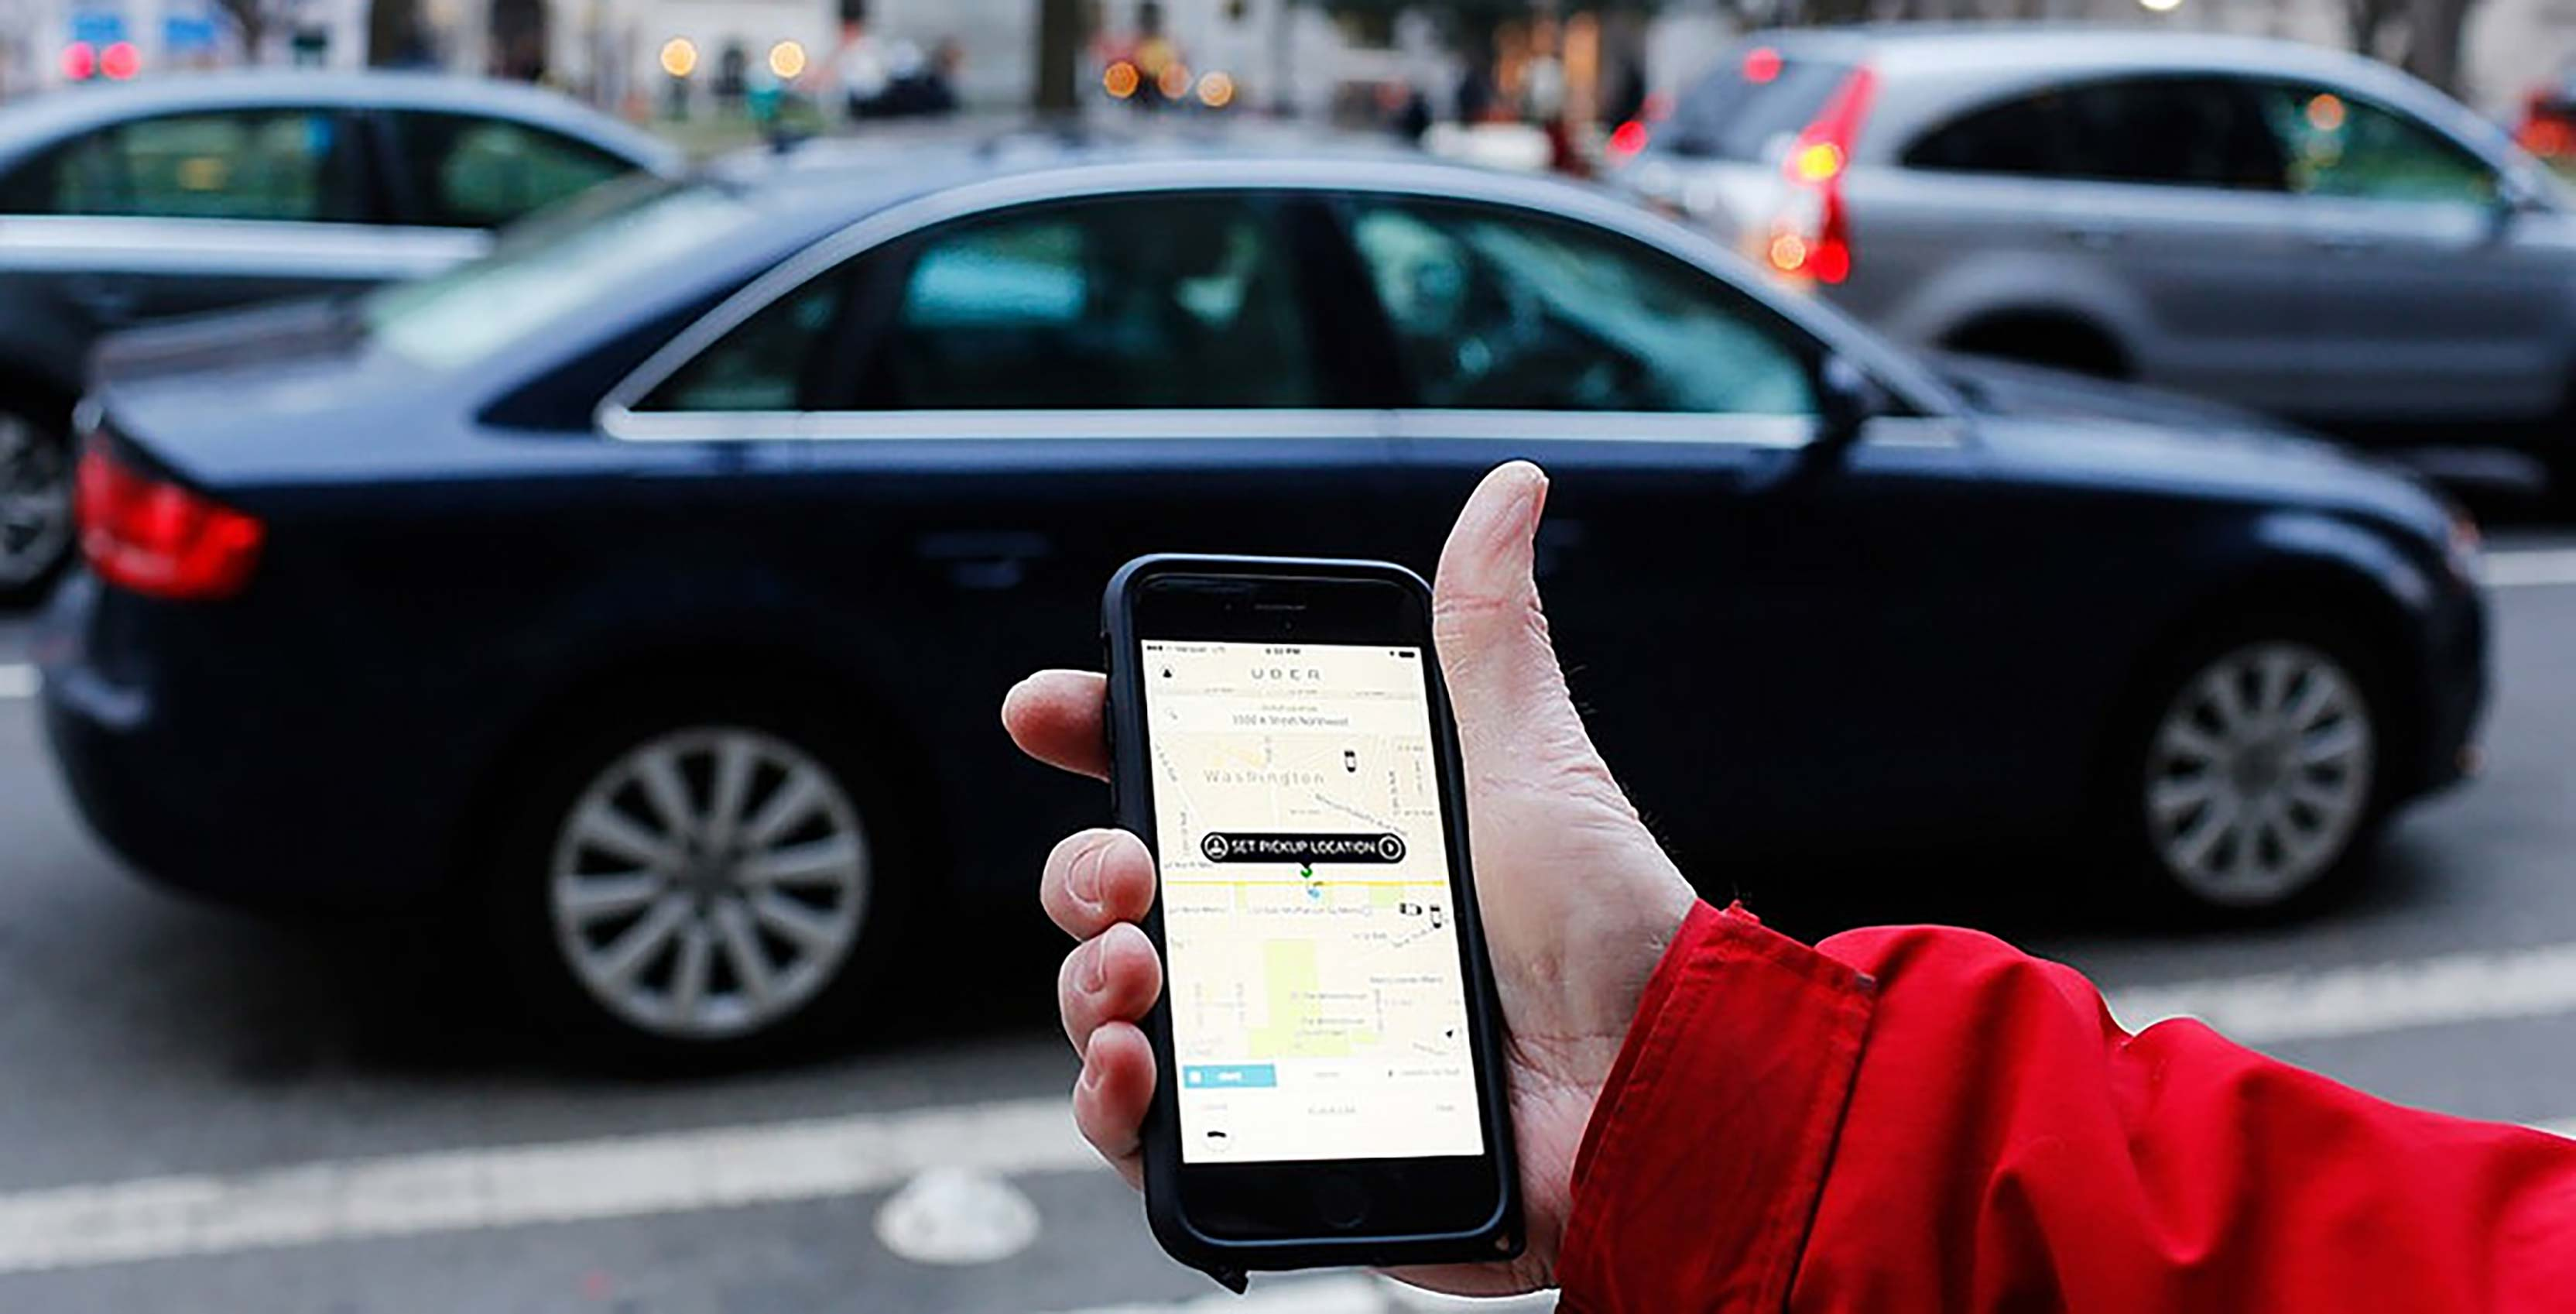 Uber pickup